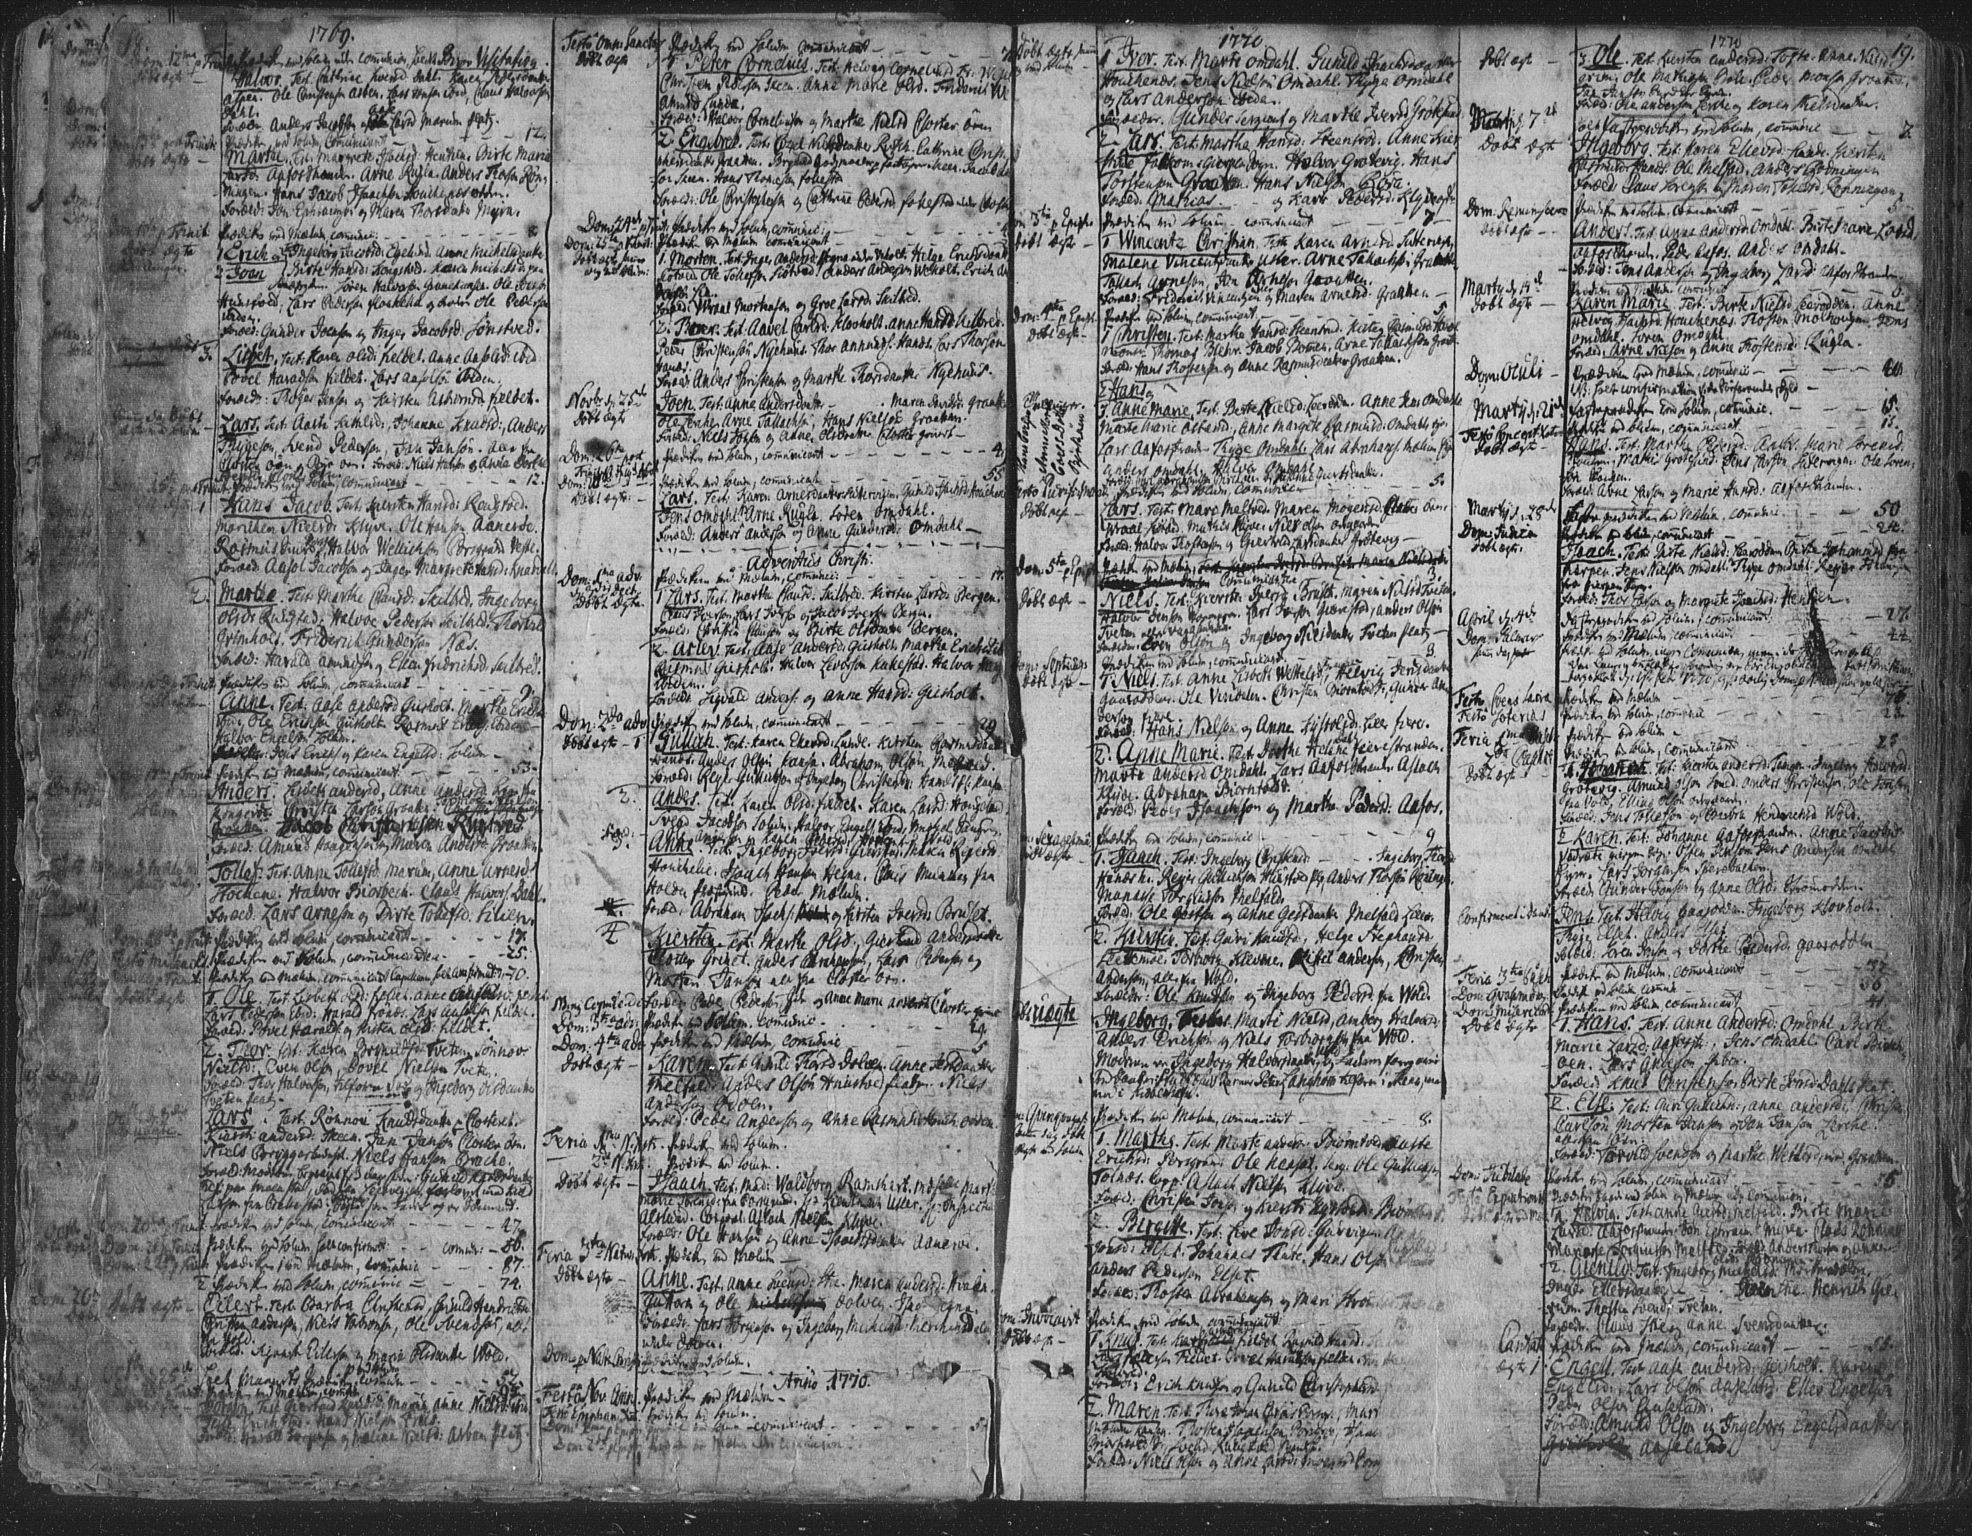 SAKO, Solum kirkebøker, F/Fa/L0003: Ministerialbok nr. I 3, 1761-1814, s. 18-19